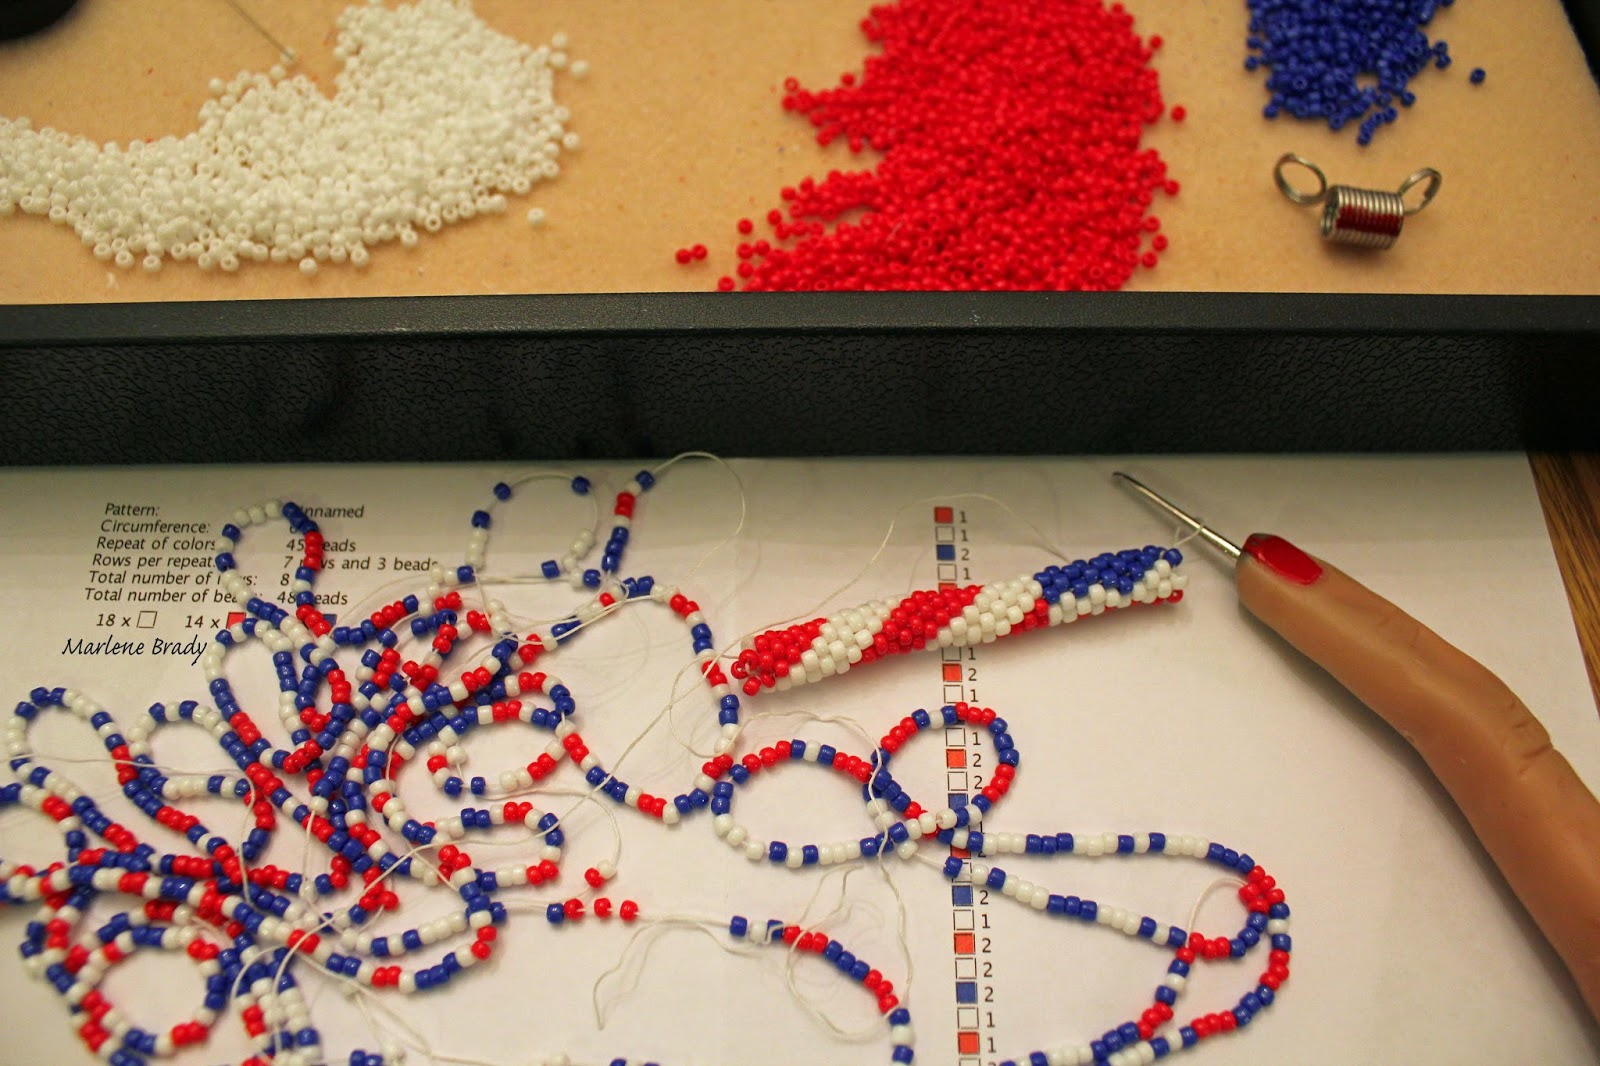 Crochet Pattern Program : Marlene Brady: May 2013